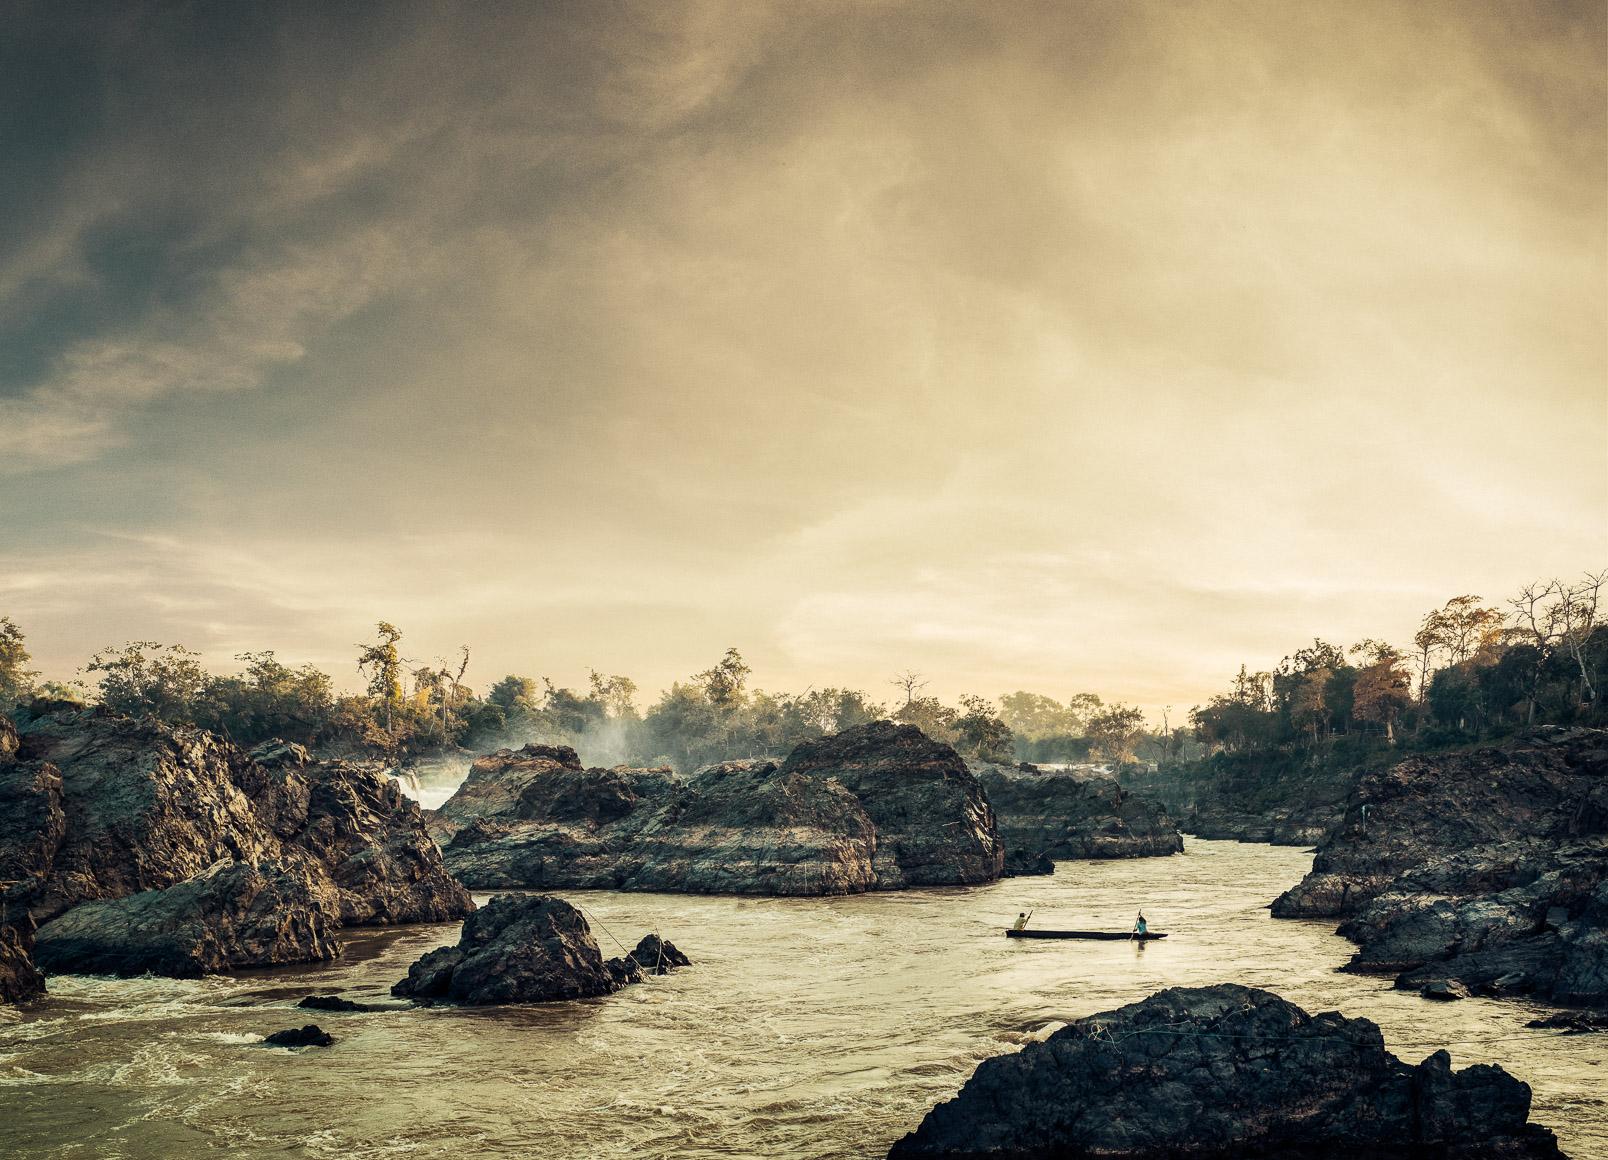 4000_Islands_Boatman-Edit.jpg